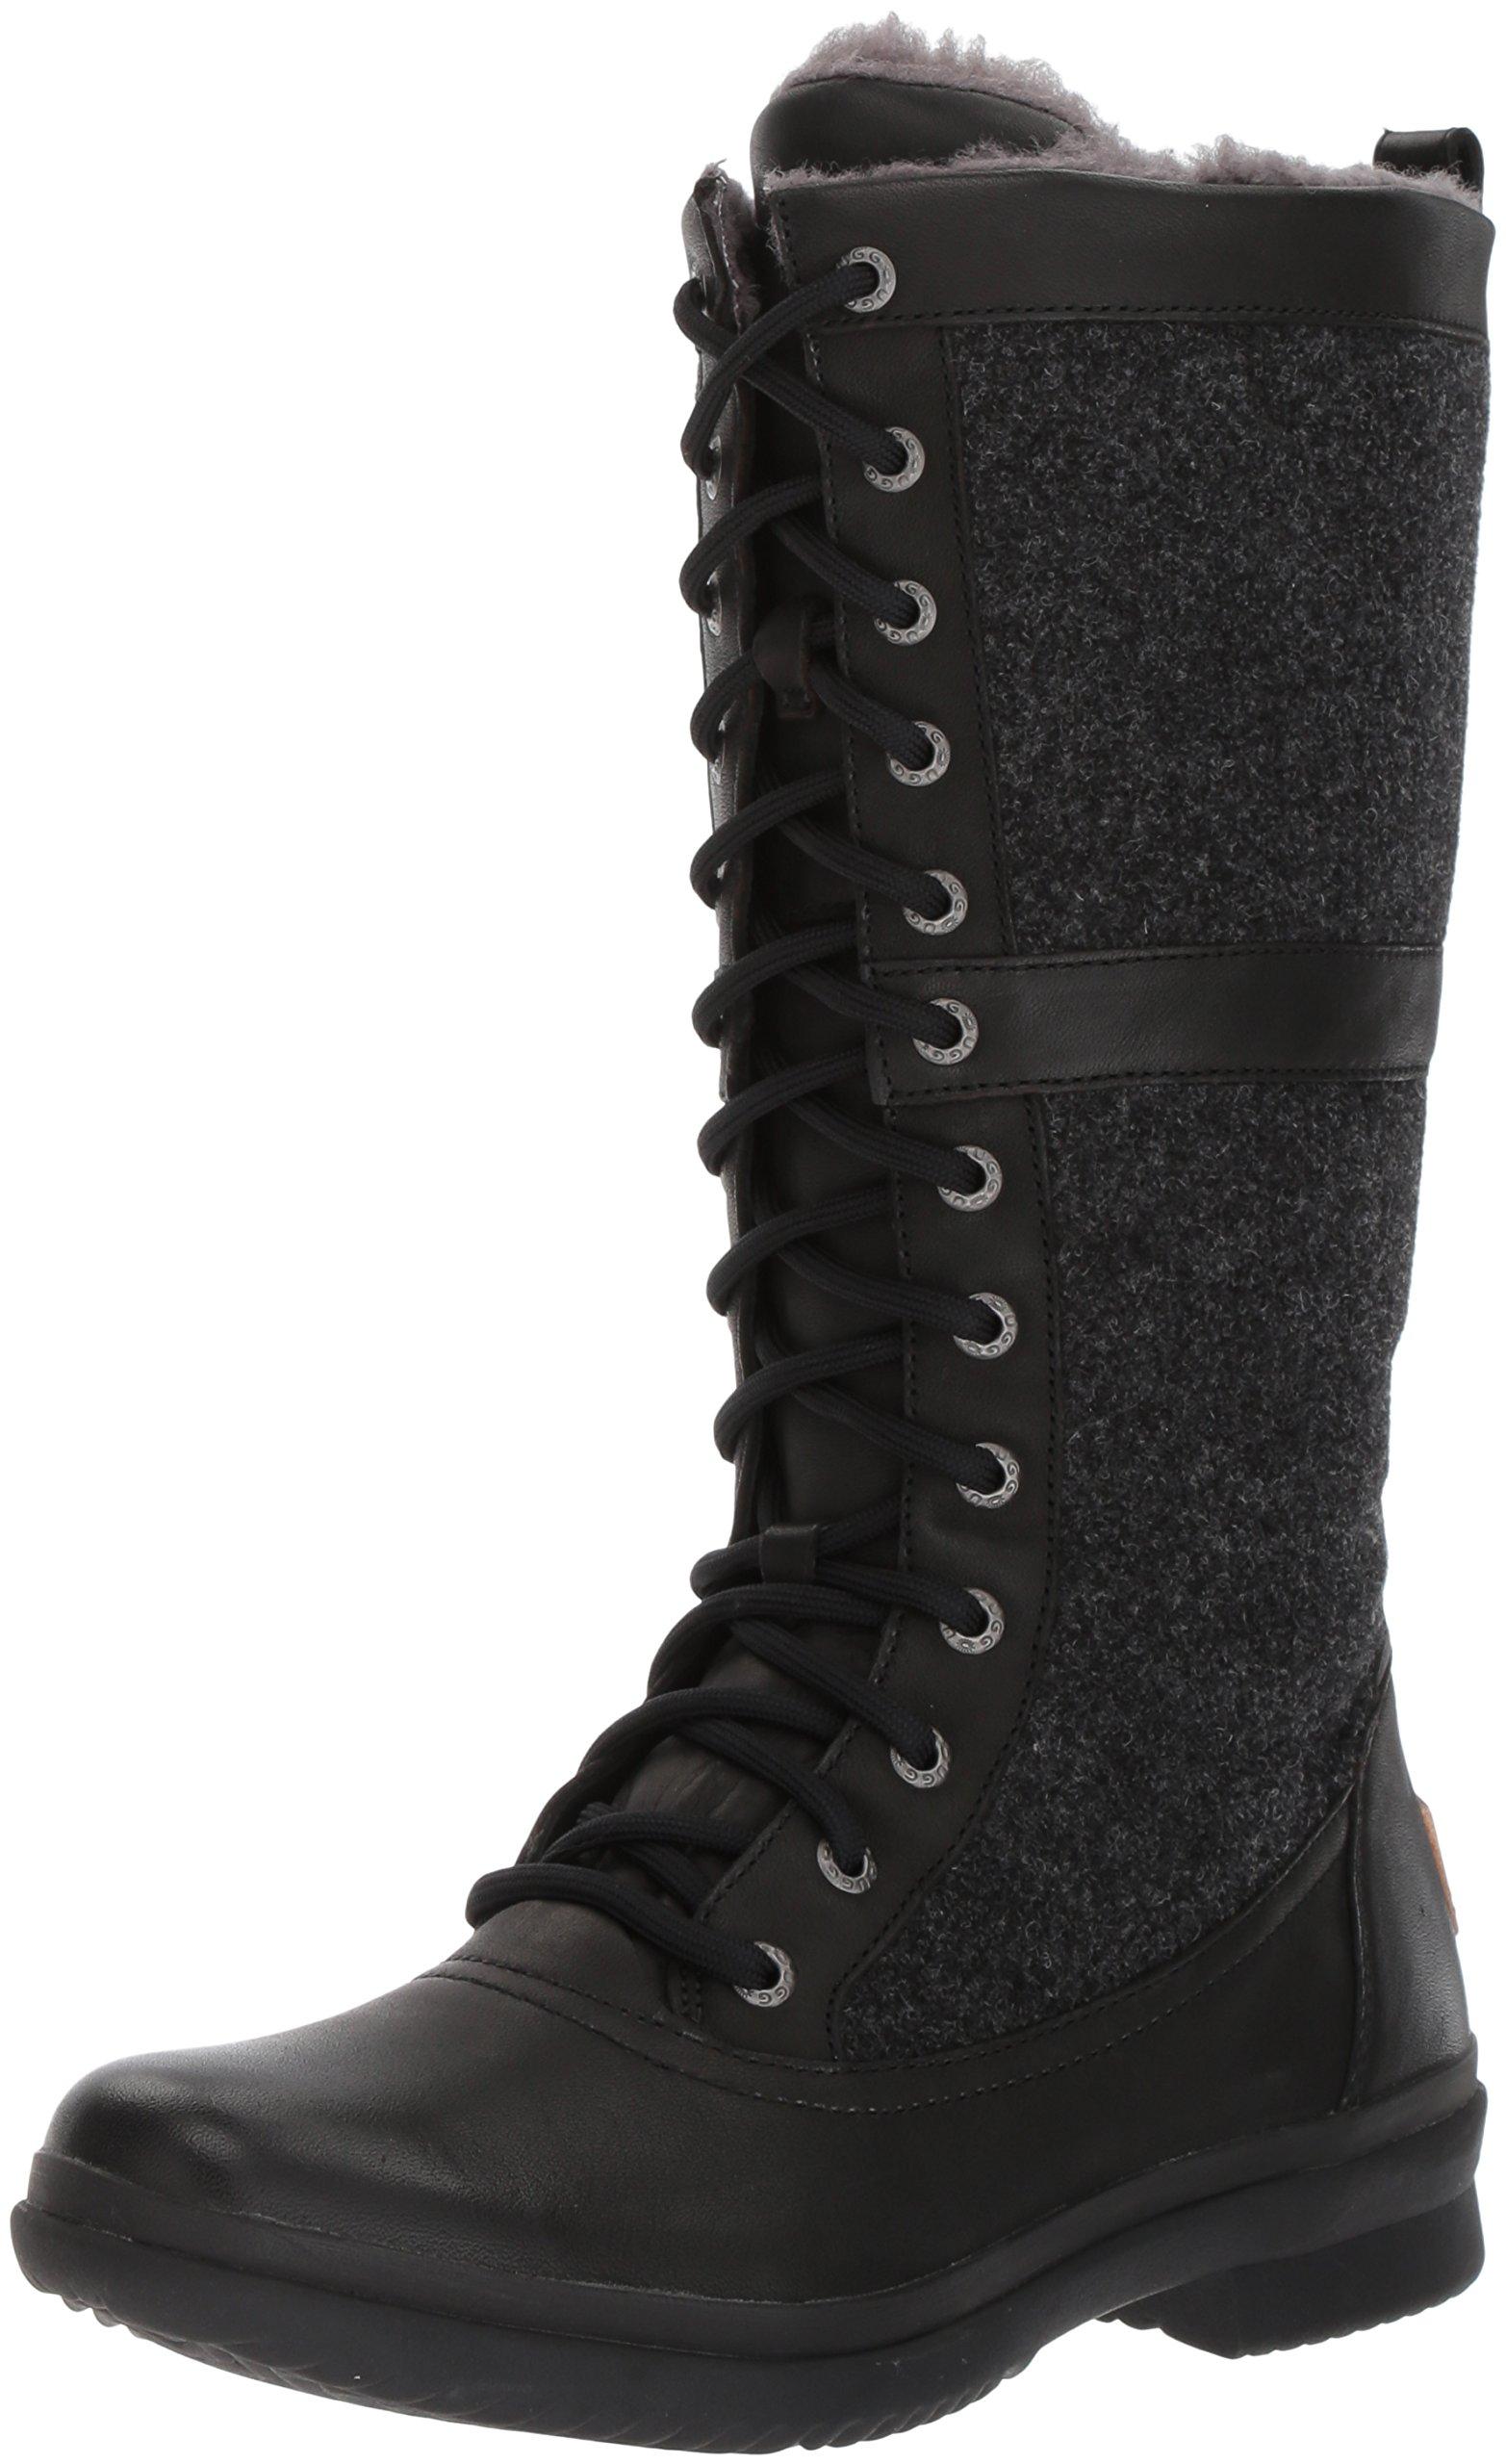 UGG Women's Elvia Boot, Black, 8 M US